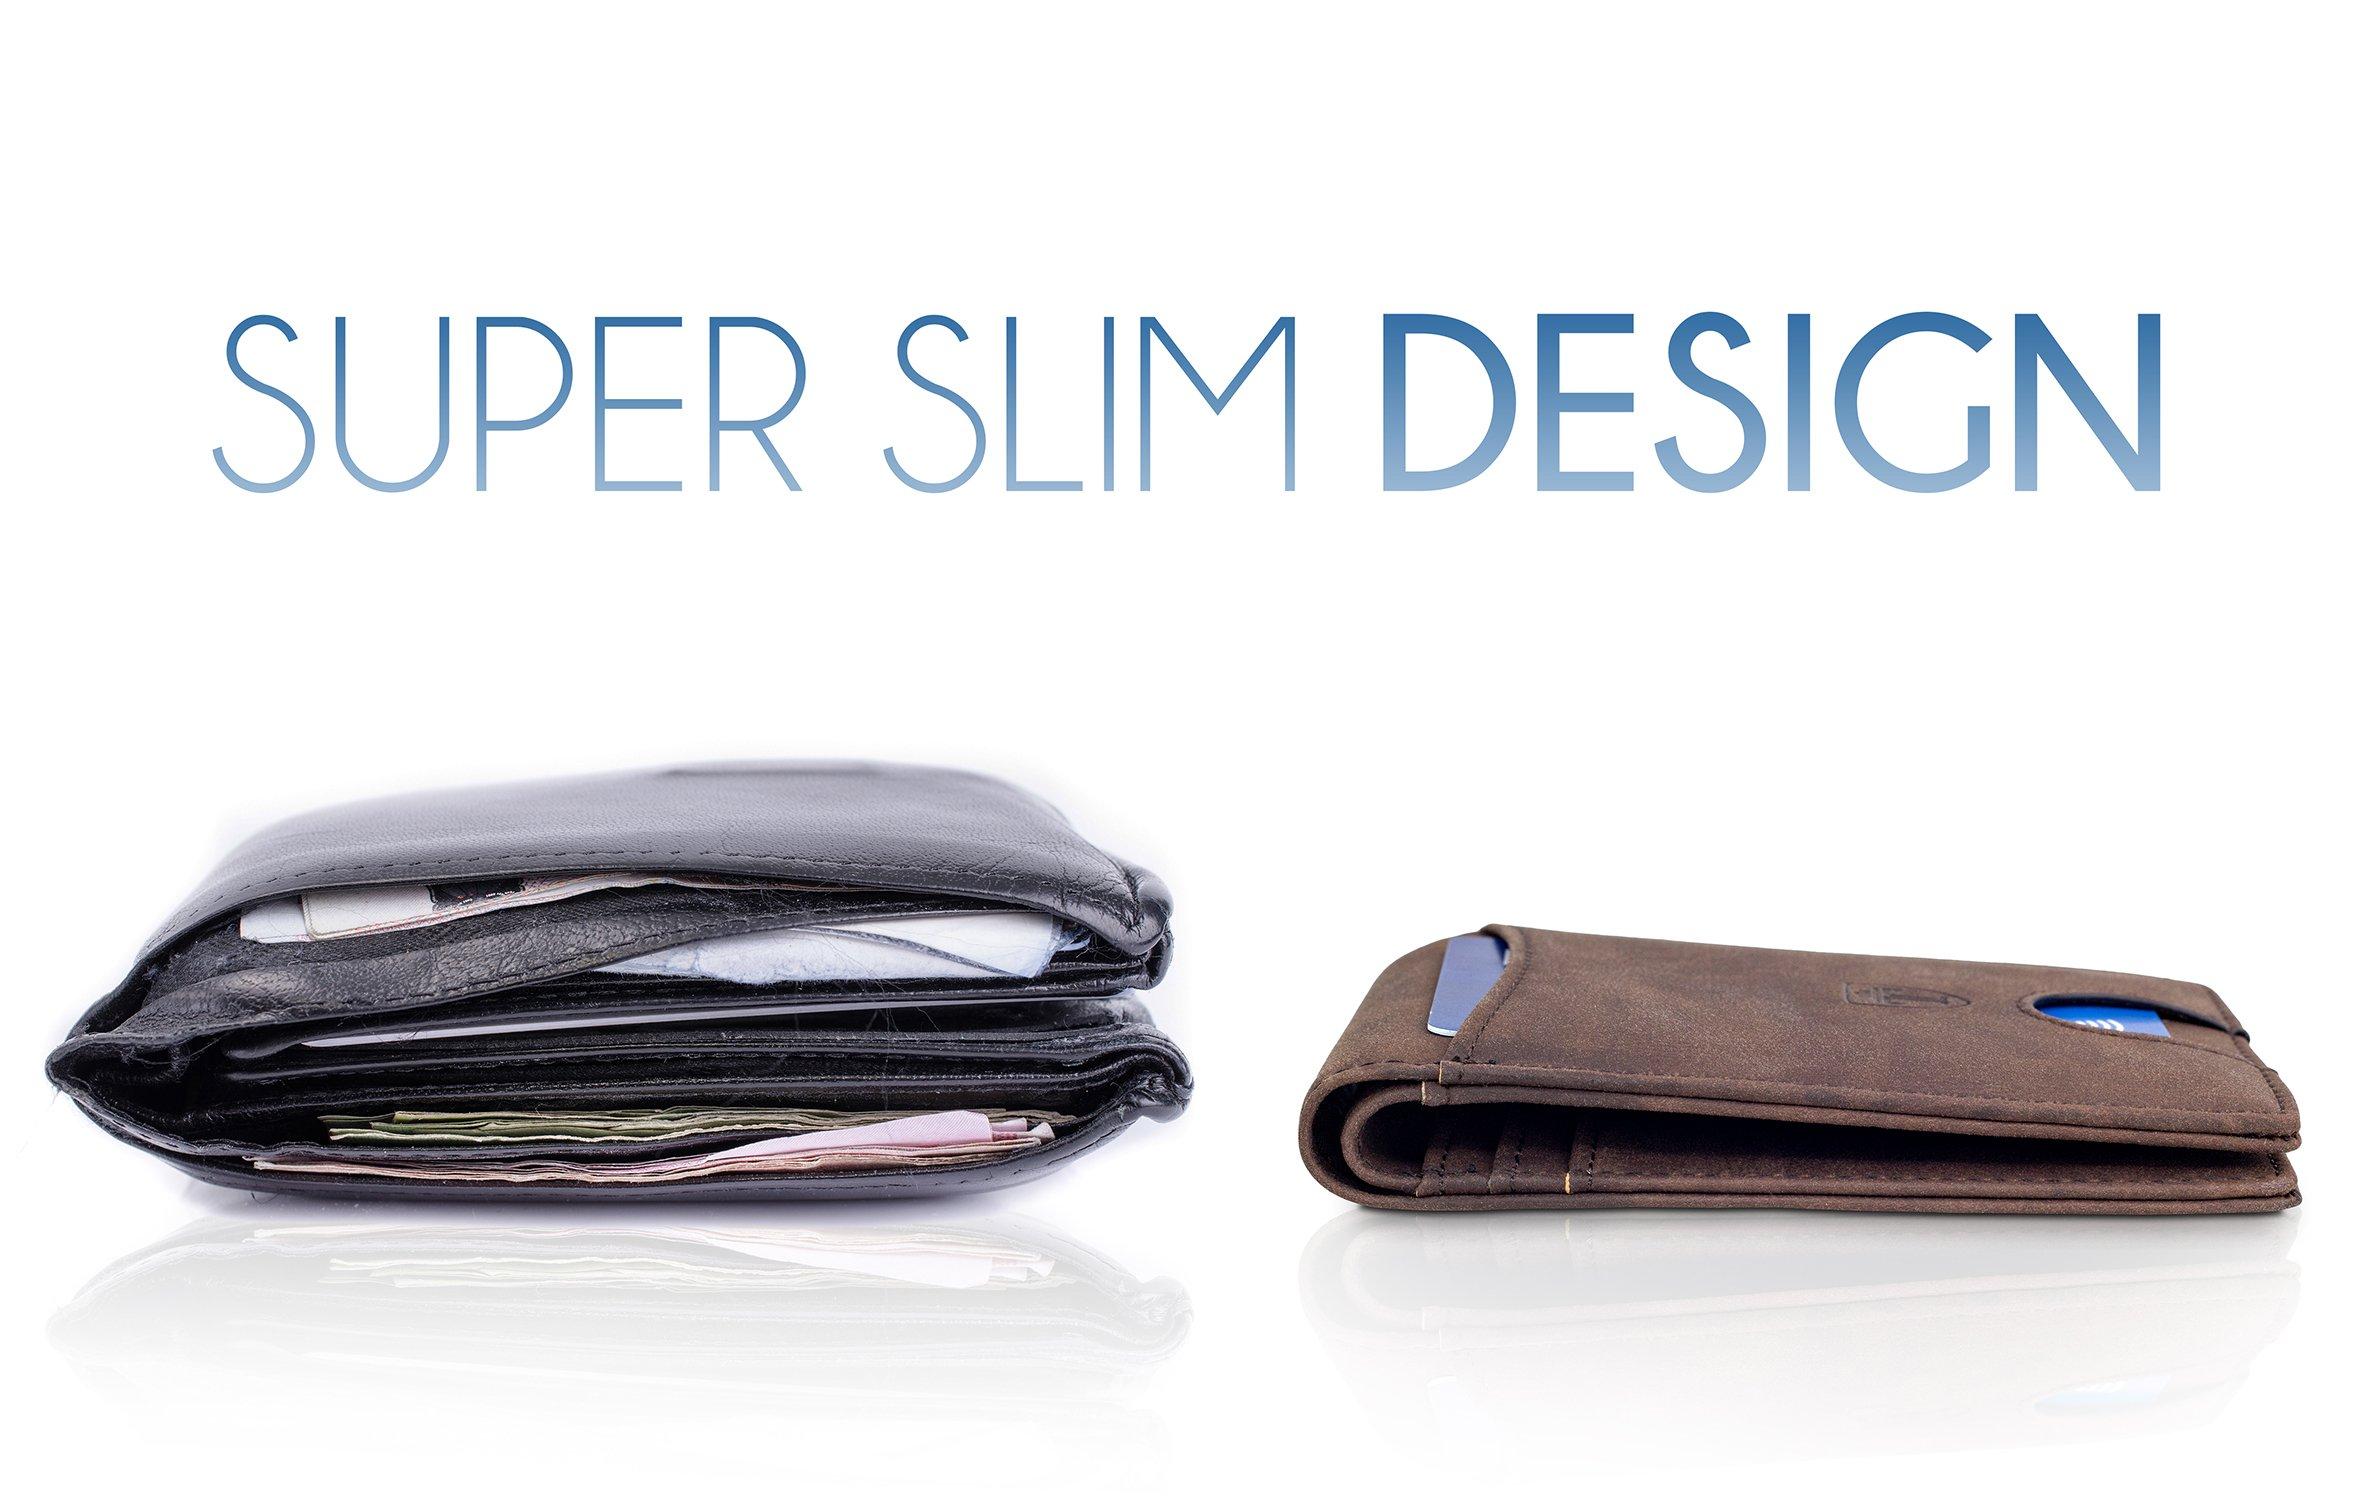 TRAVANDO Slim Wallets BUFFALO - RFID Blocking Wallet - 8 Card Pockets - Mini Credit Card Holder - Travel Wallet - Minimalist Bifold Wallet for Men with Gift Box by Travando (Image #6)